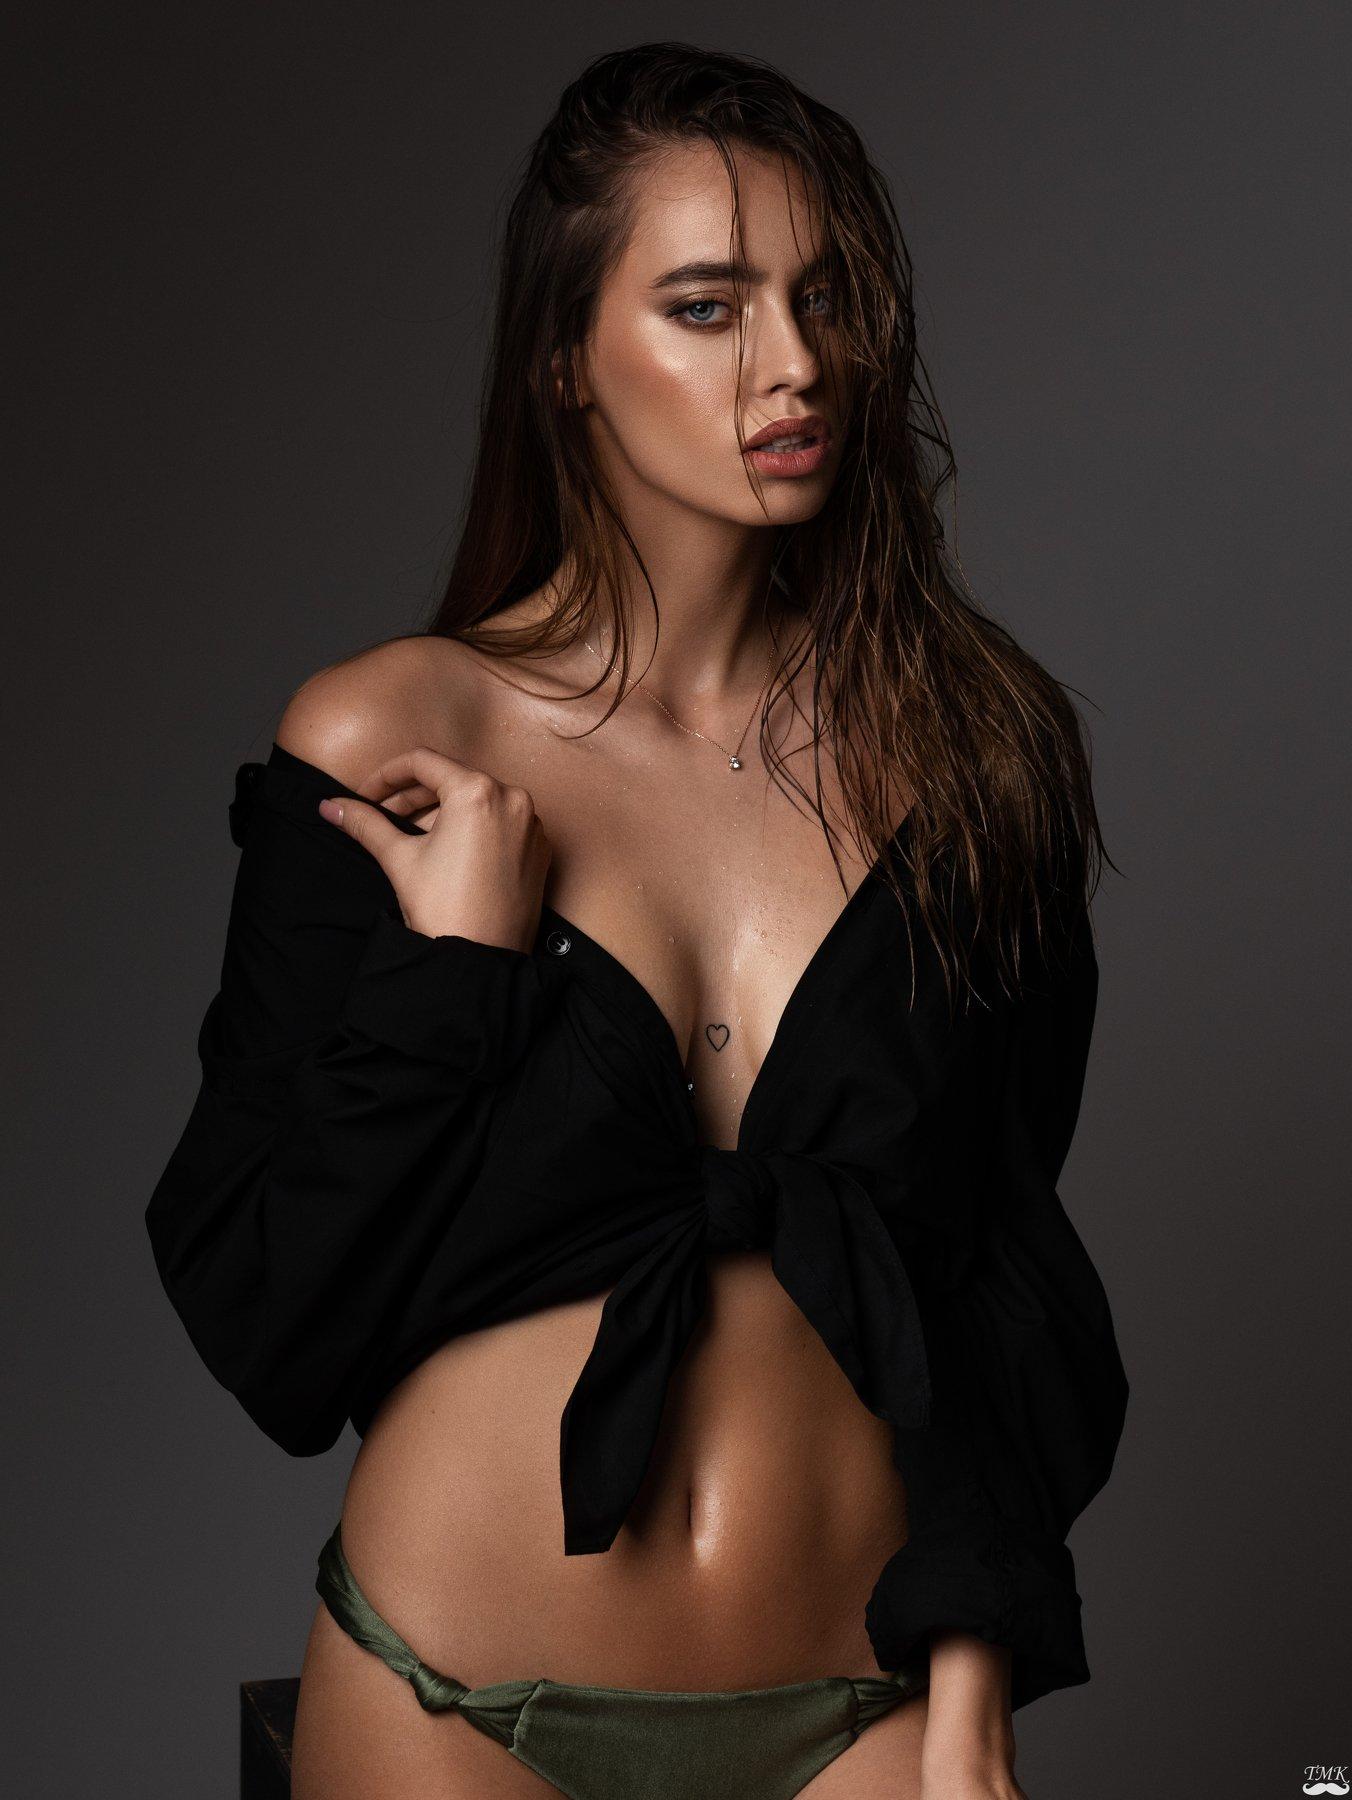 portrait, woman, studio, studio light, female, beauty, wet, water, water drops, people, look, style, tattoo, fashion, glamour, Masoit Tomas